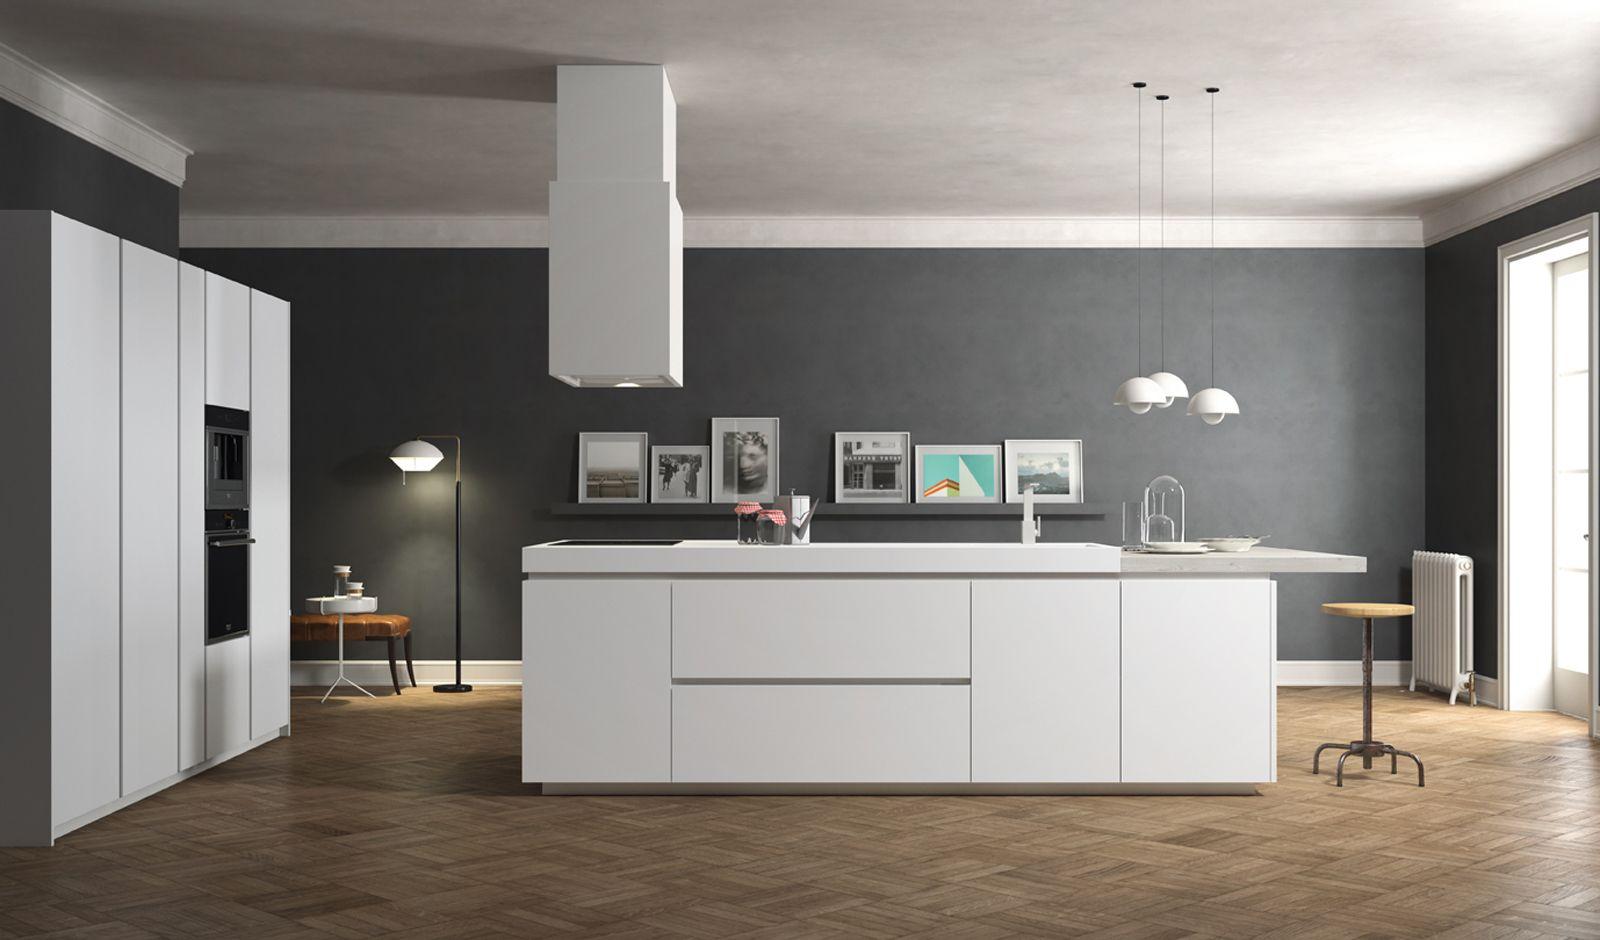 cucina bianca parquet - Cerca con Google | TOTAL WHITE HOUSE ...